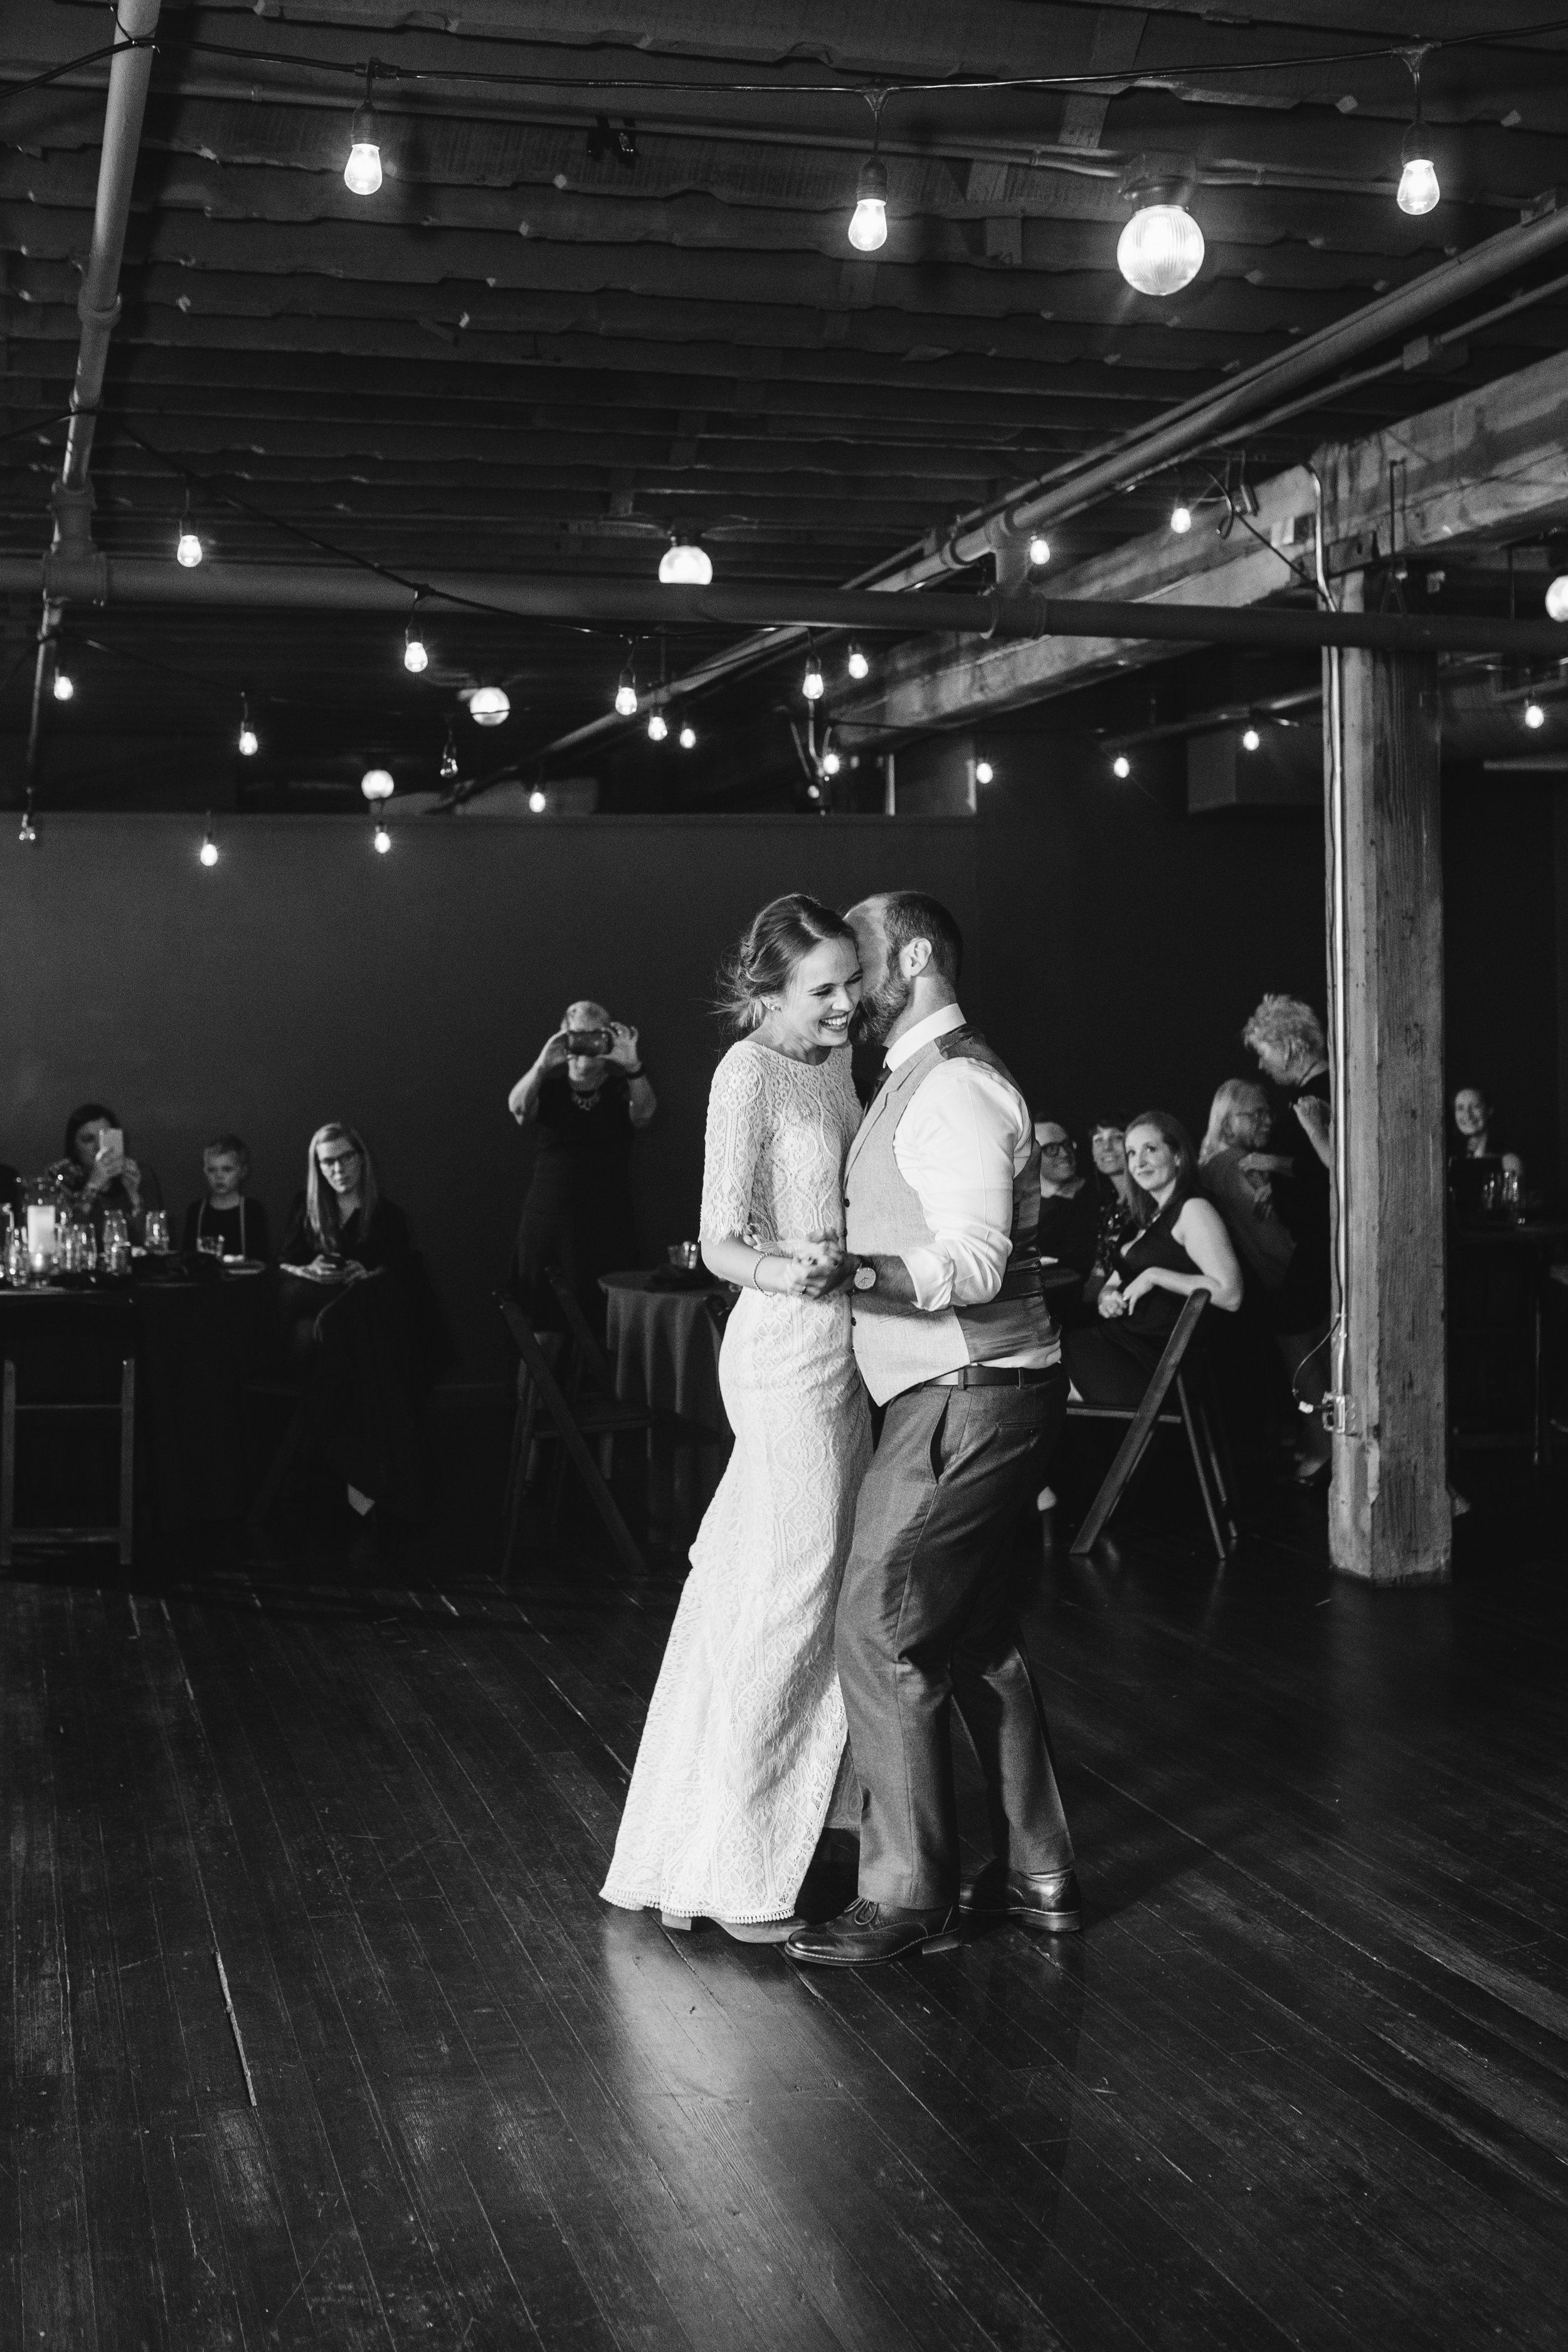 Tom's Town Distillery - kansas City Wedding first dance photo